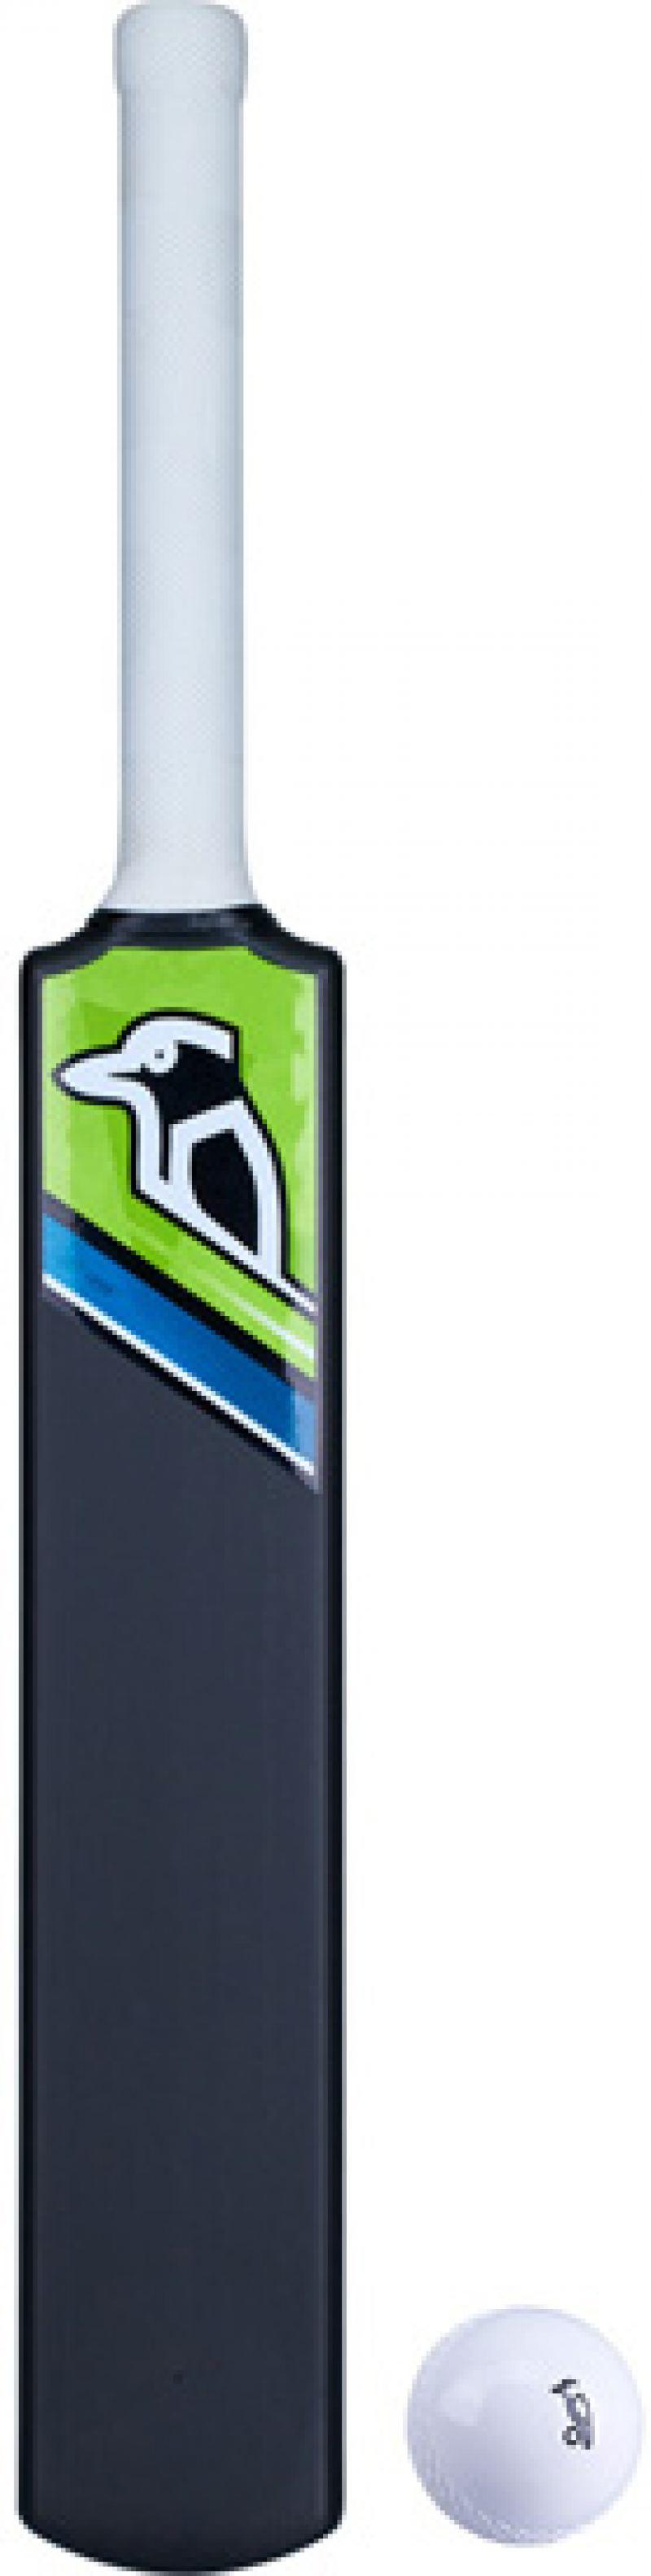 Kookaburra Blast Cricket Bat and Ball Set